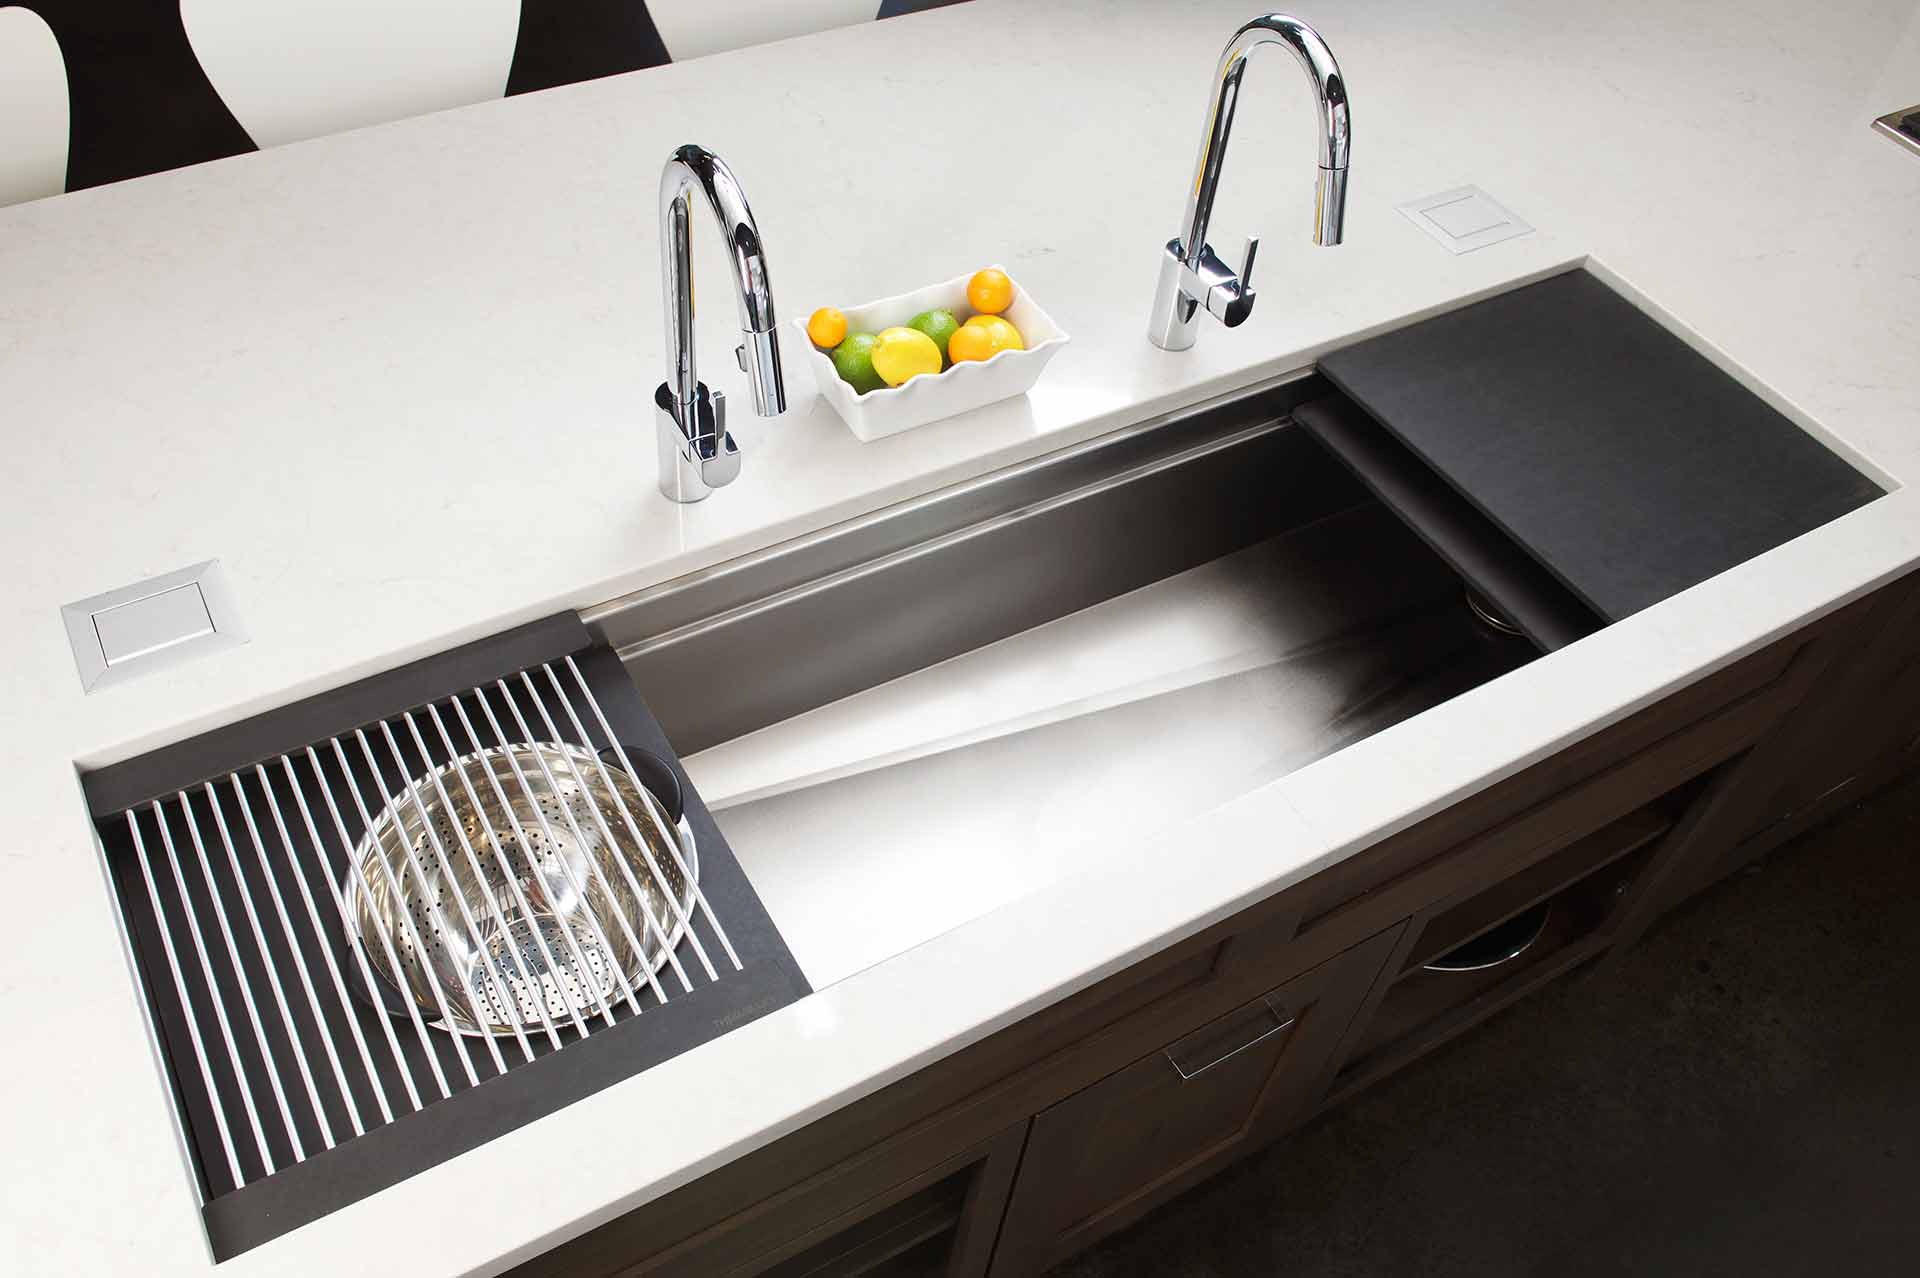 The Galley Reinvent Your Kitchen Sink Focal Point Hardware